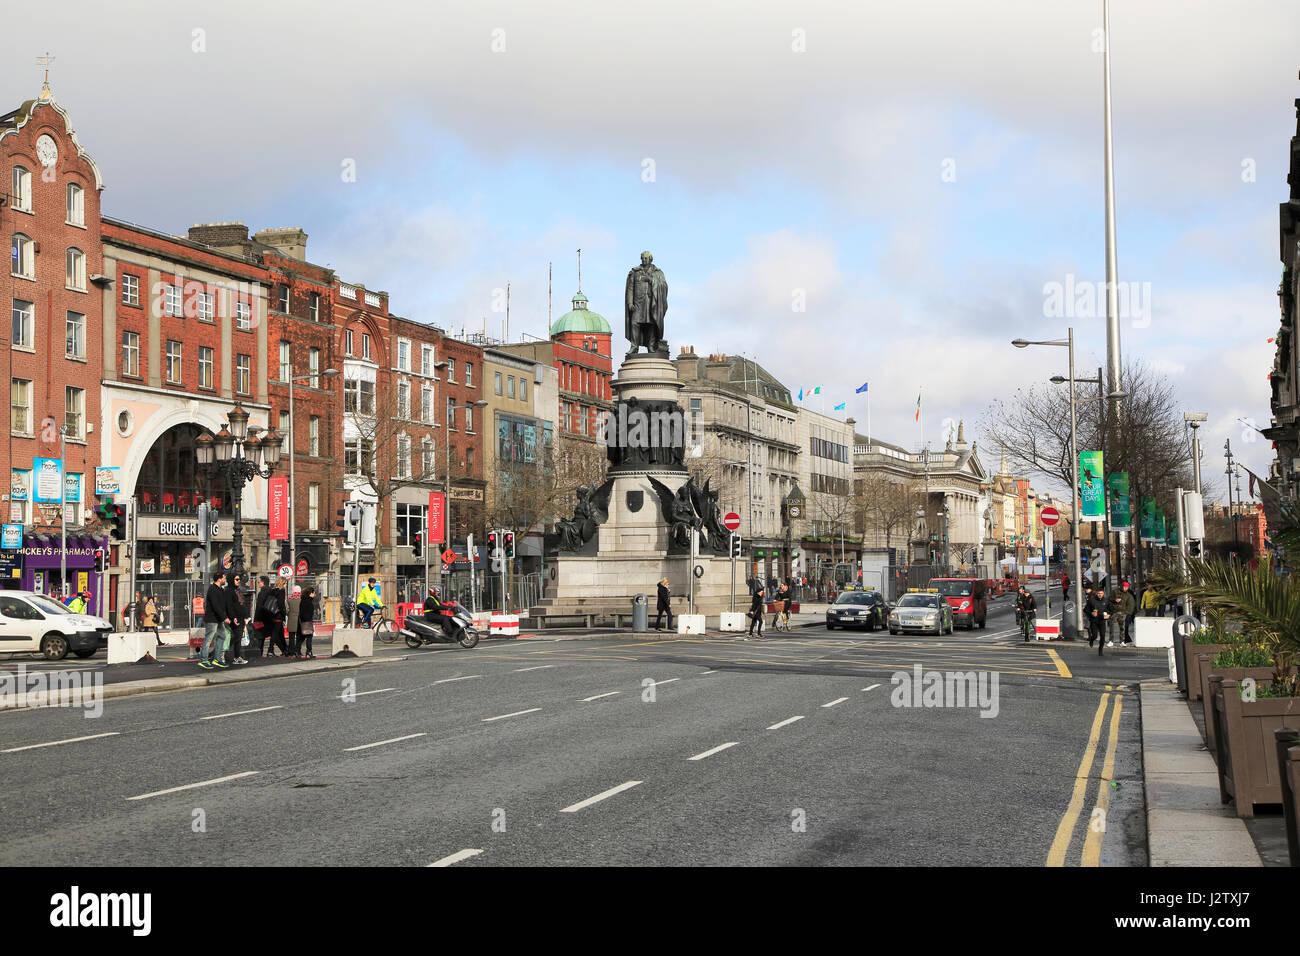 O'Connell Monument, O'Connell Street, city centre of Dublin, Ireland, Irish Republic Stock Photo